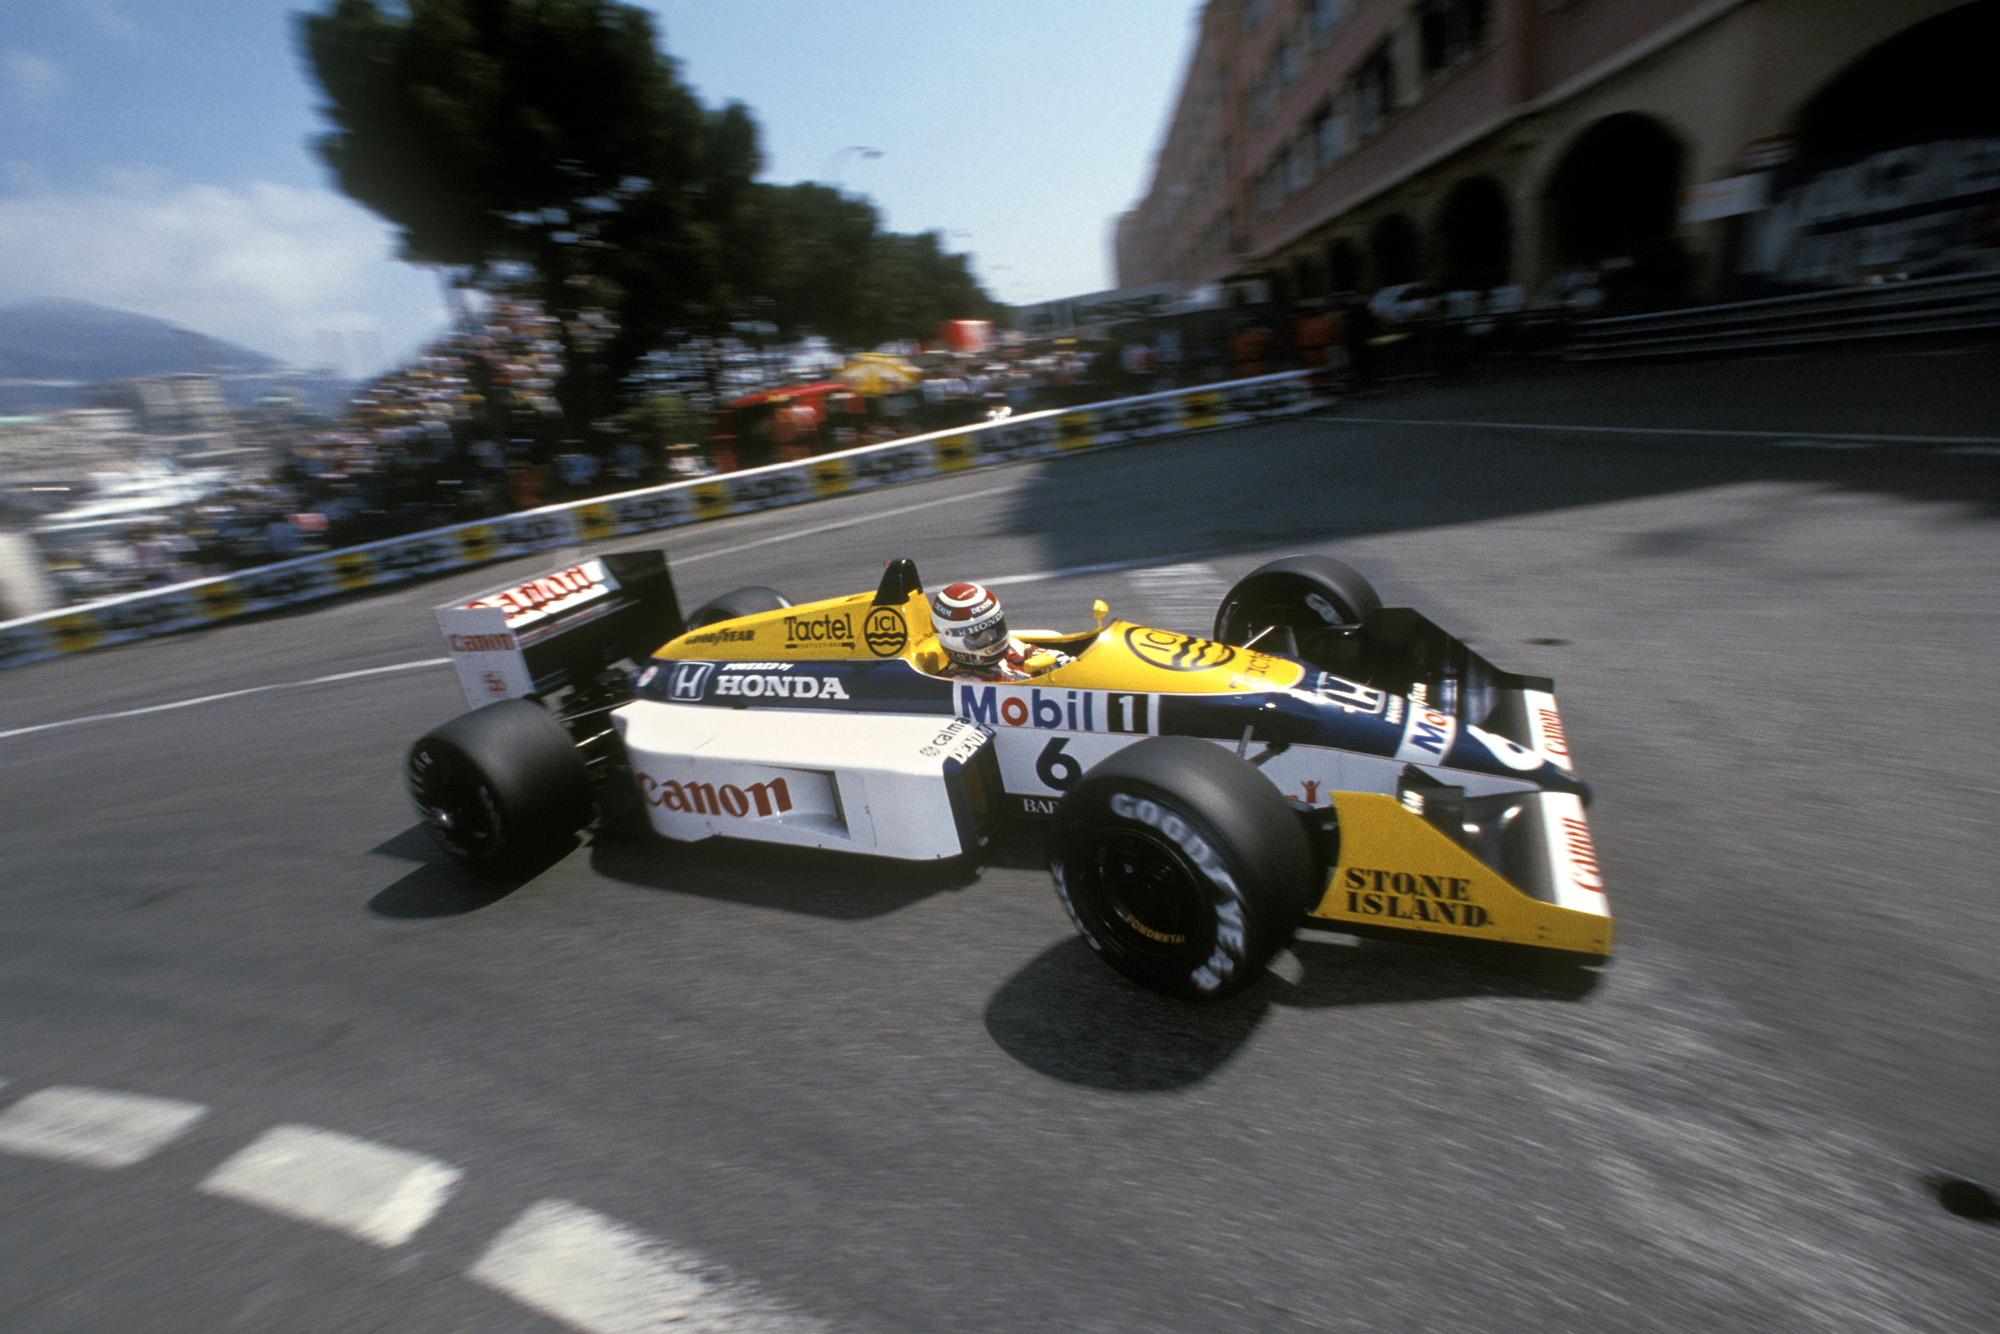 Nelson Piquet at the 1987 Monaco Grand Prix